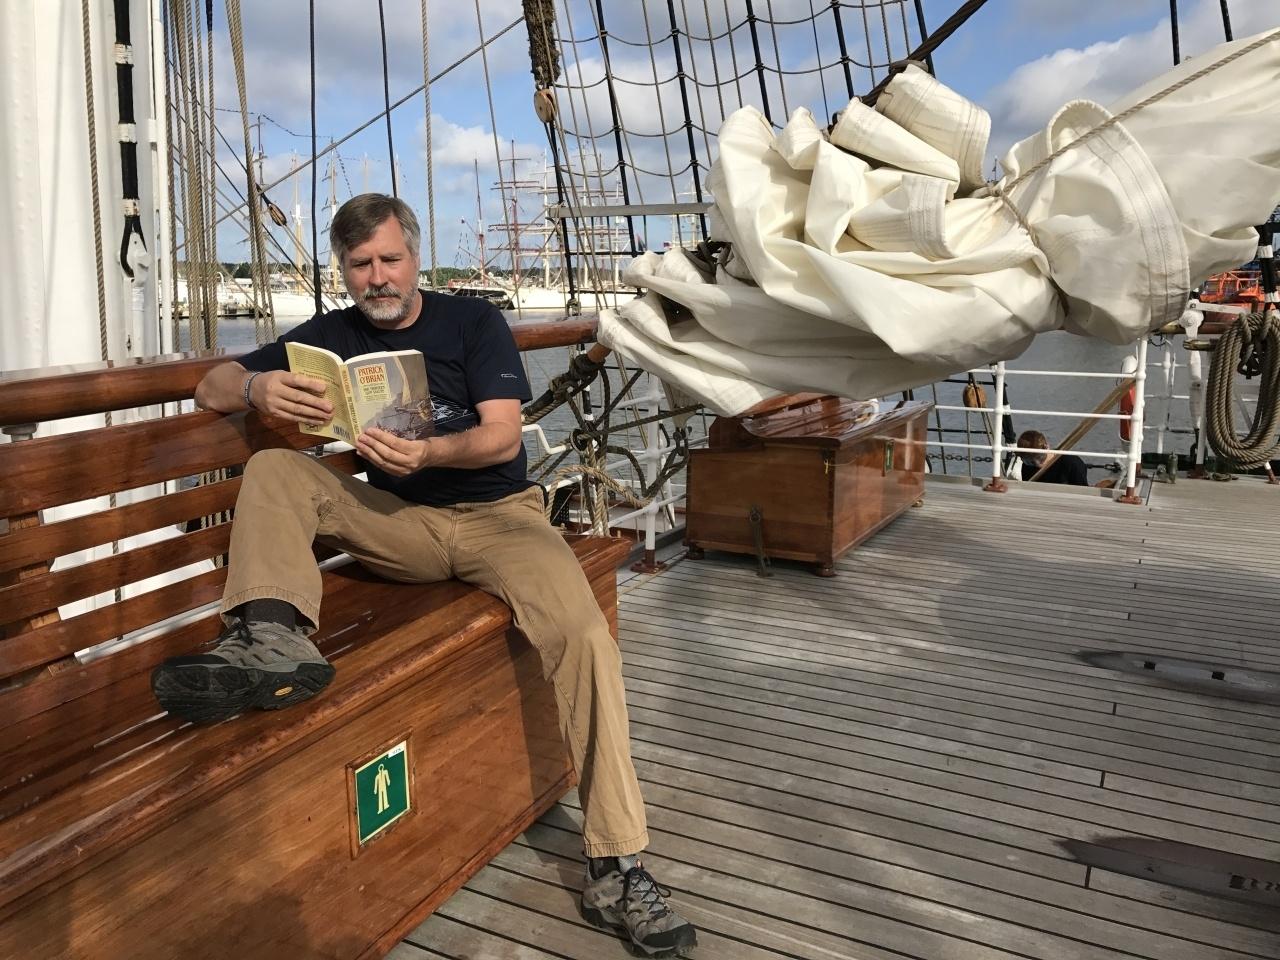 Me reading a sailing book where I longed for a sailing adventure.